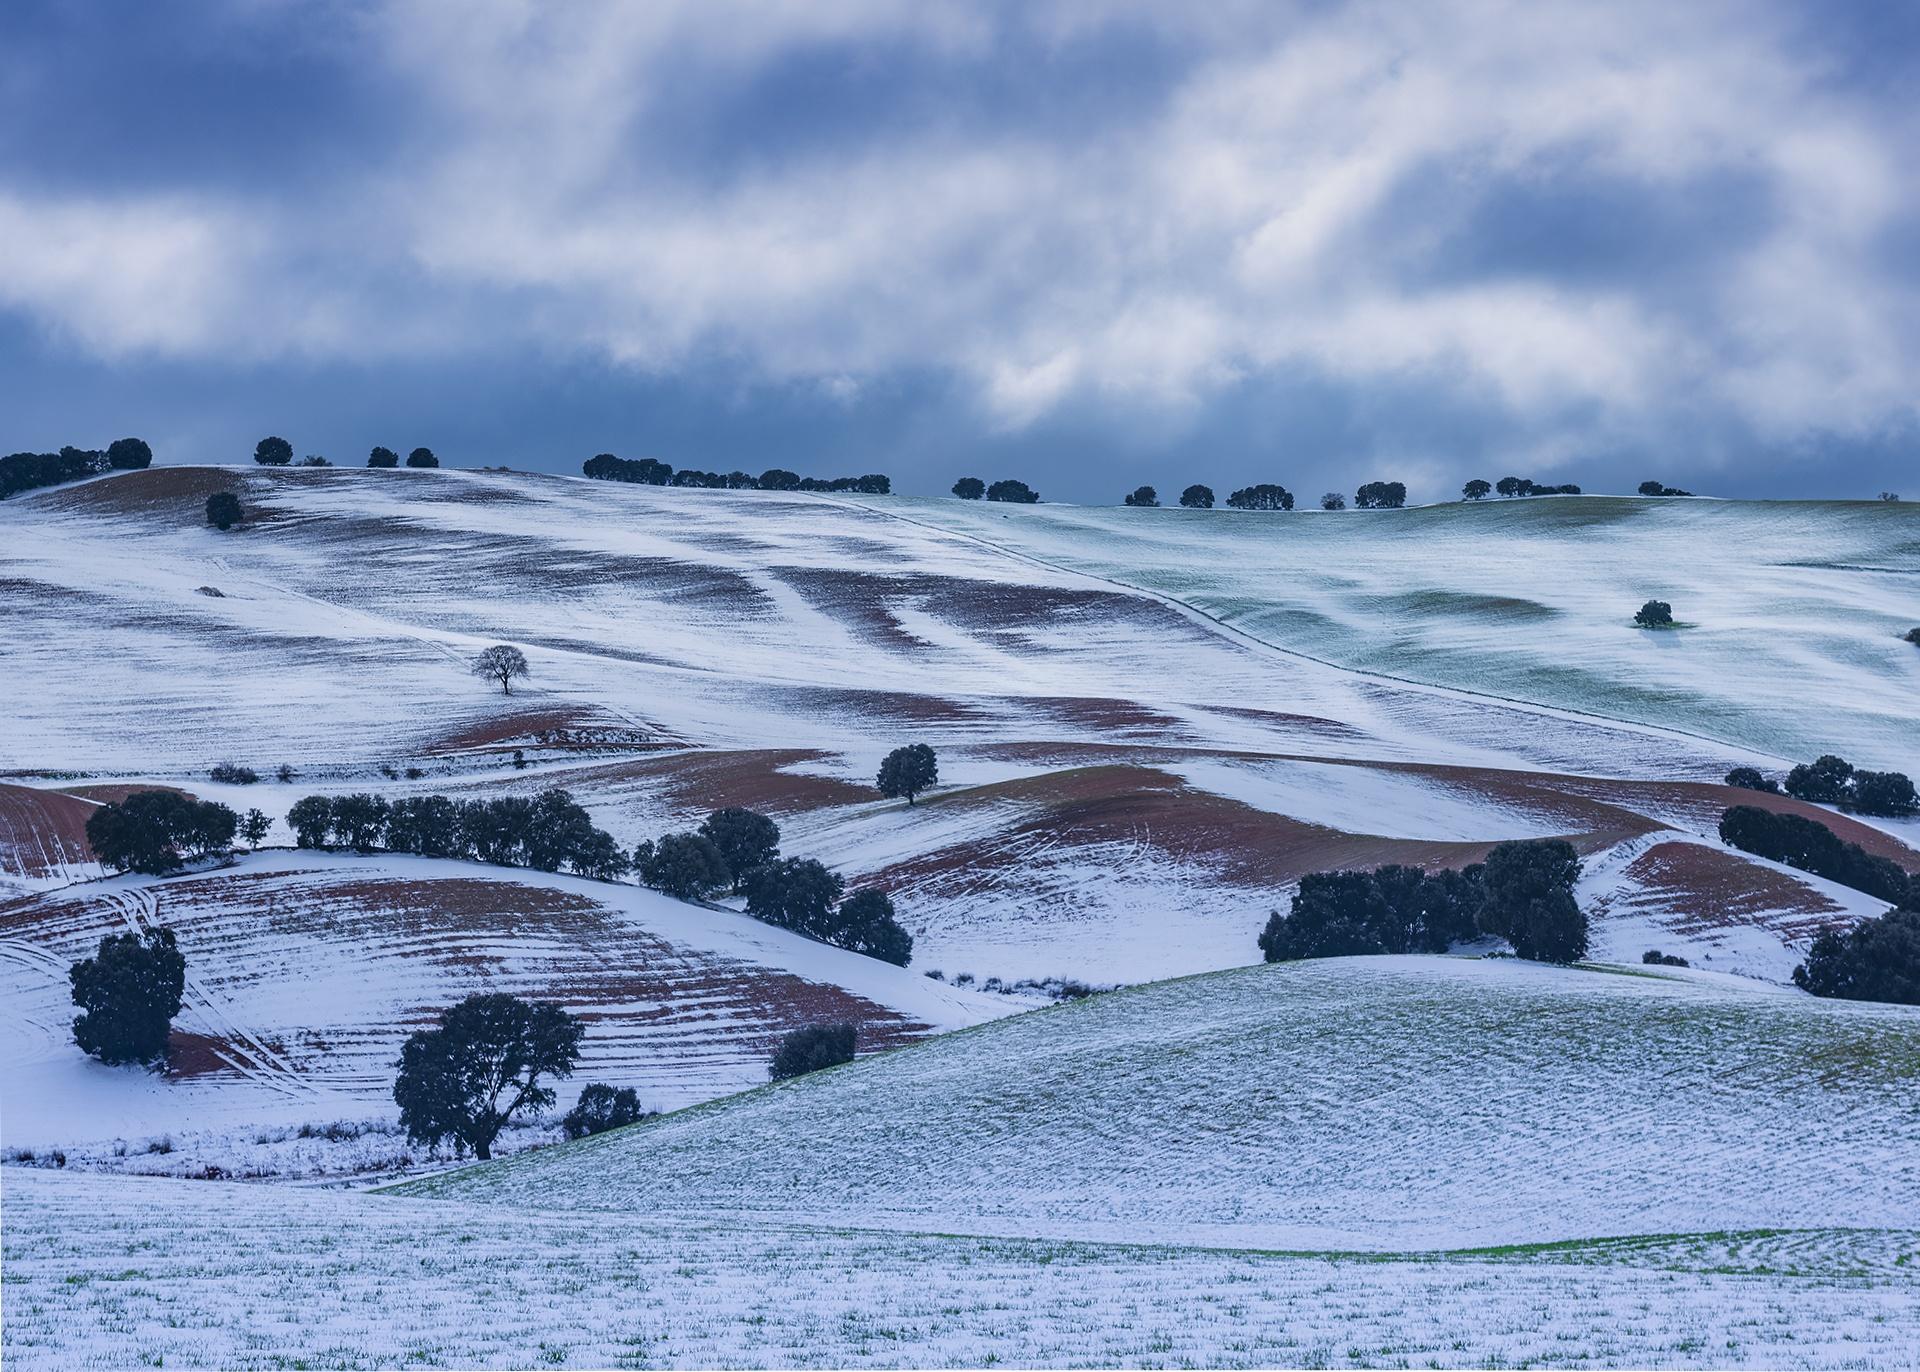 Montes Orientales - Undulations - Peter Manschot Al Andalus Photo Tour, Landscape photography photos prints workshops Andalusia Spain